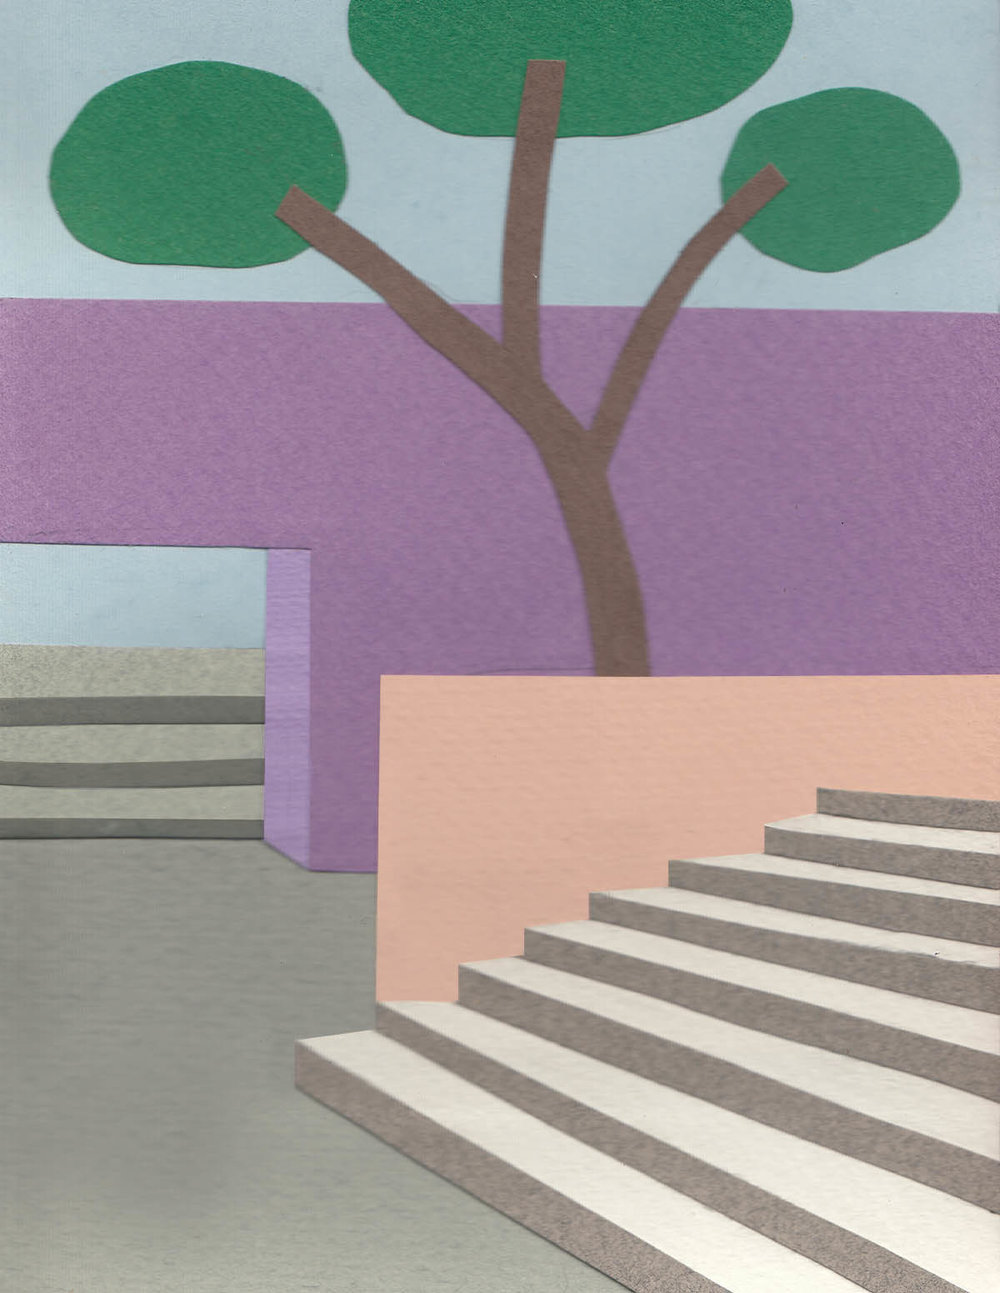 Legorreta_stairs.jpg